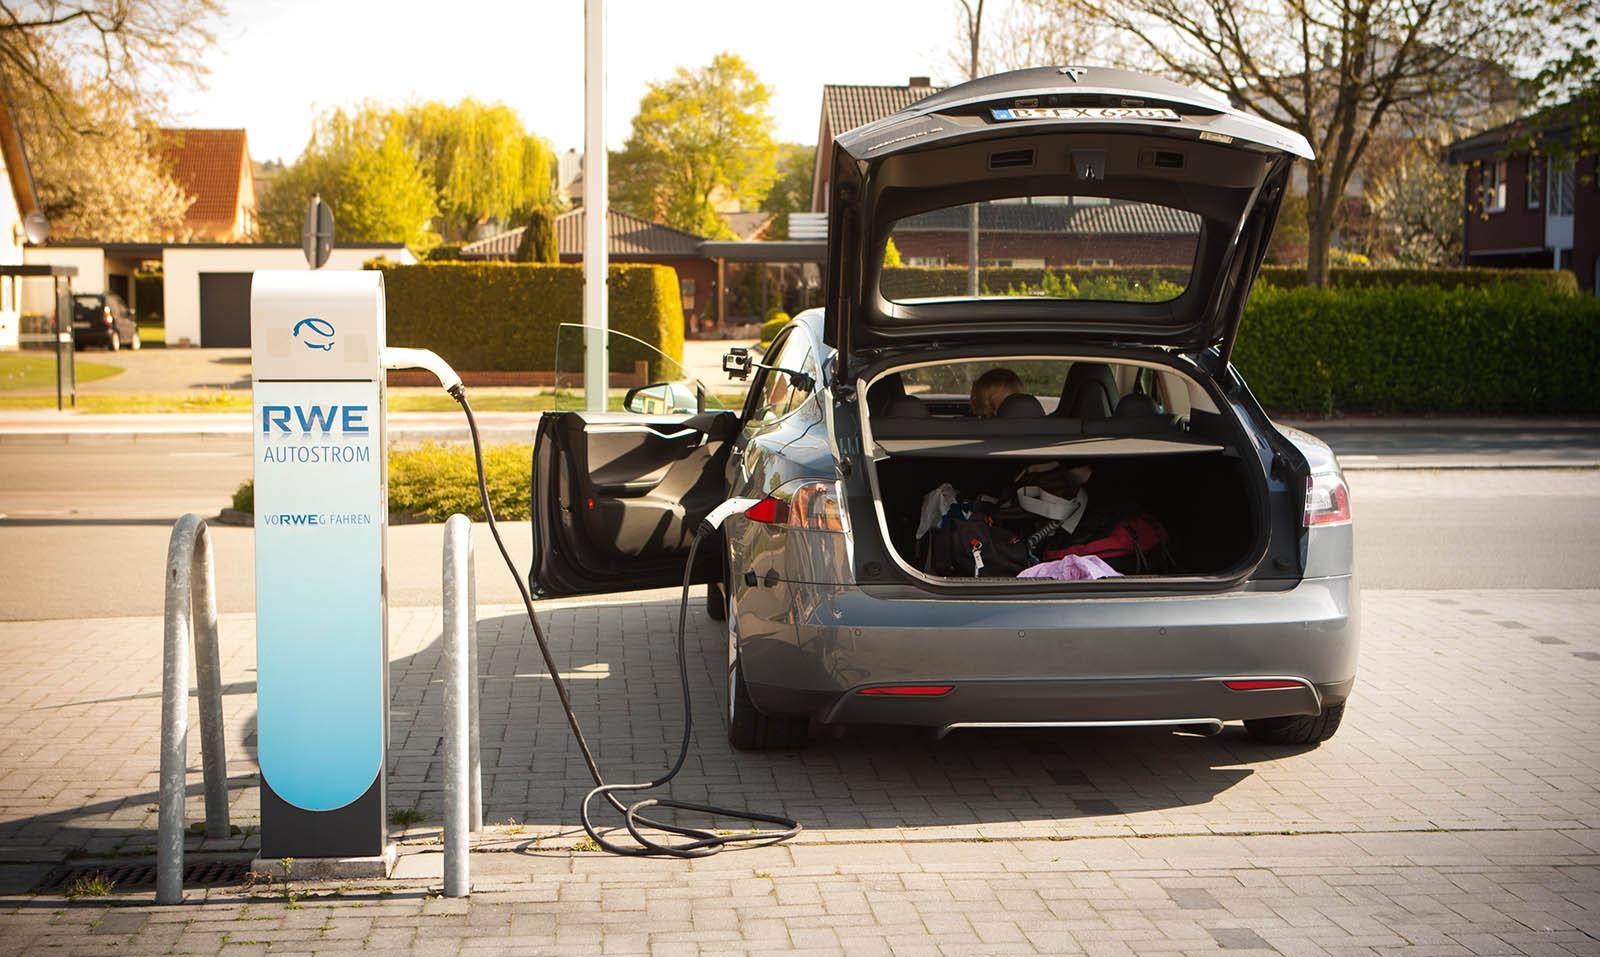 BerliiniAmsterdam-RWE-intercharge